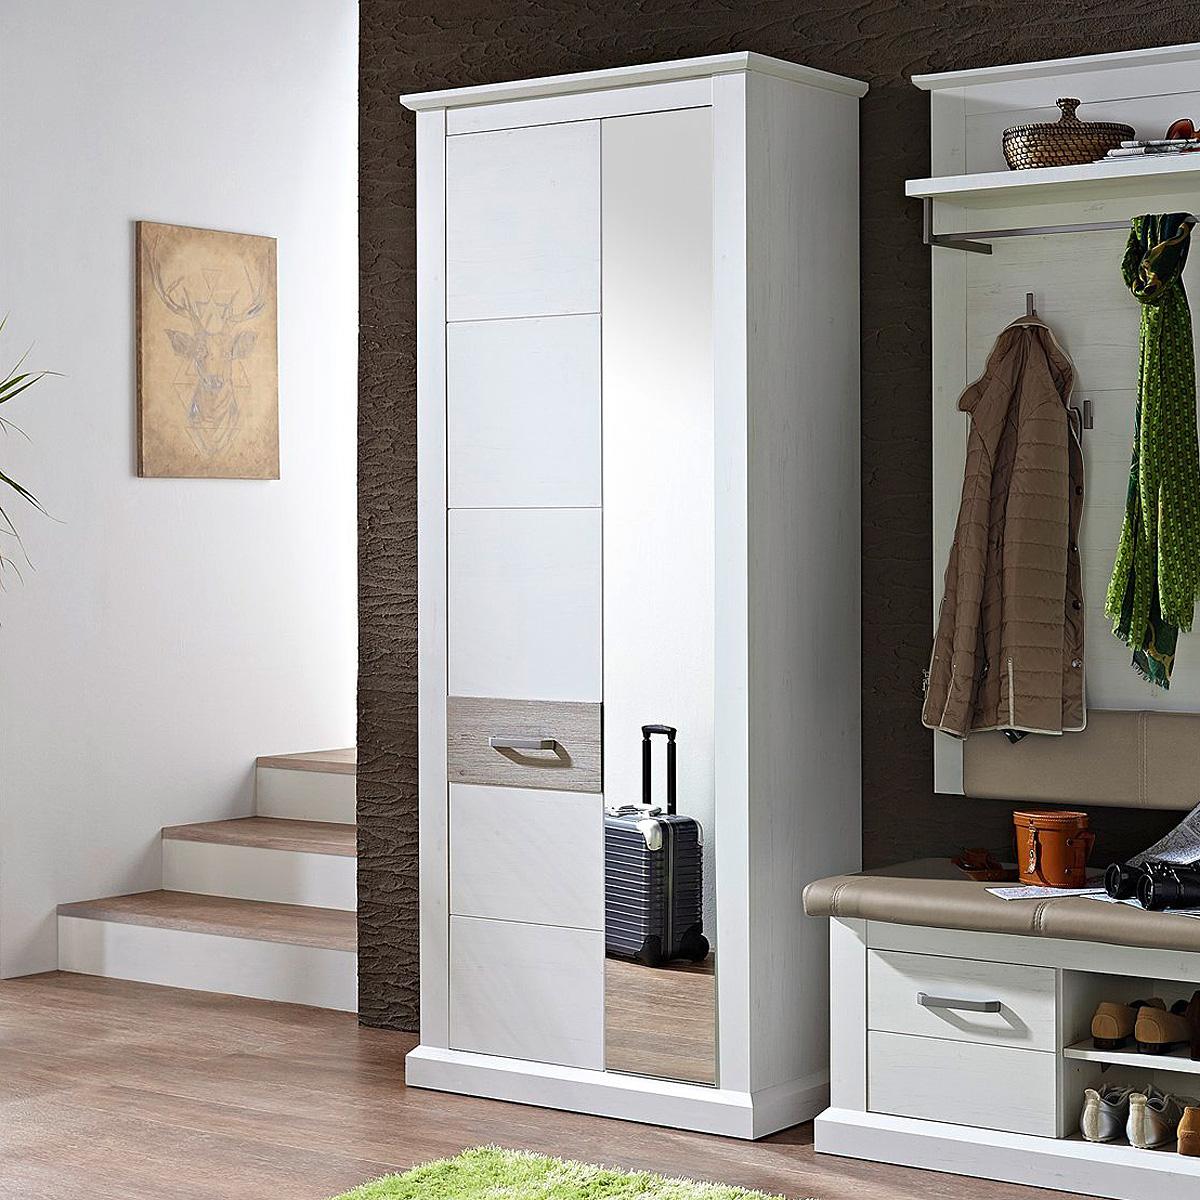 garderobenschrank 1 modena garderobe schrank flurm bel in. Black Bedroom Furniture Sets. Home Design Ideas